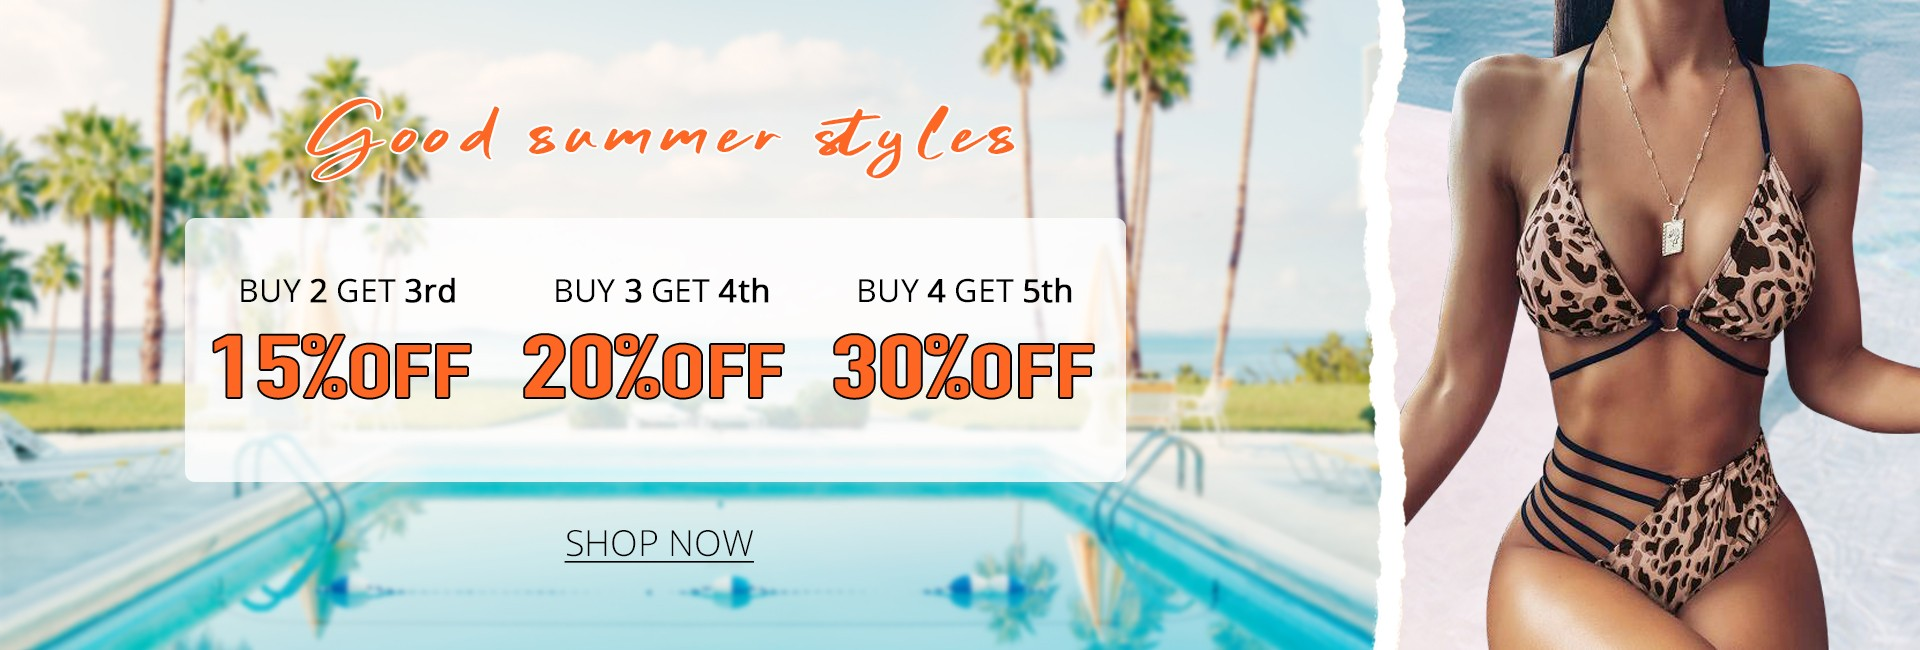 Good summer styles